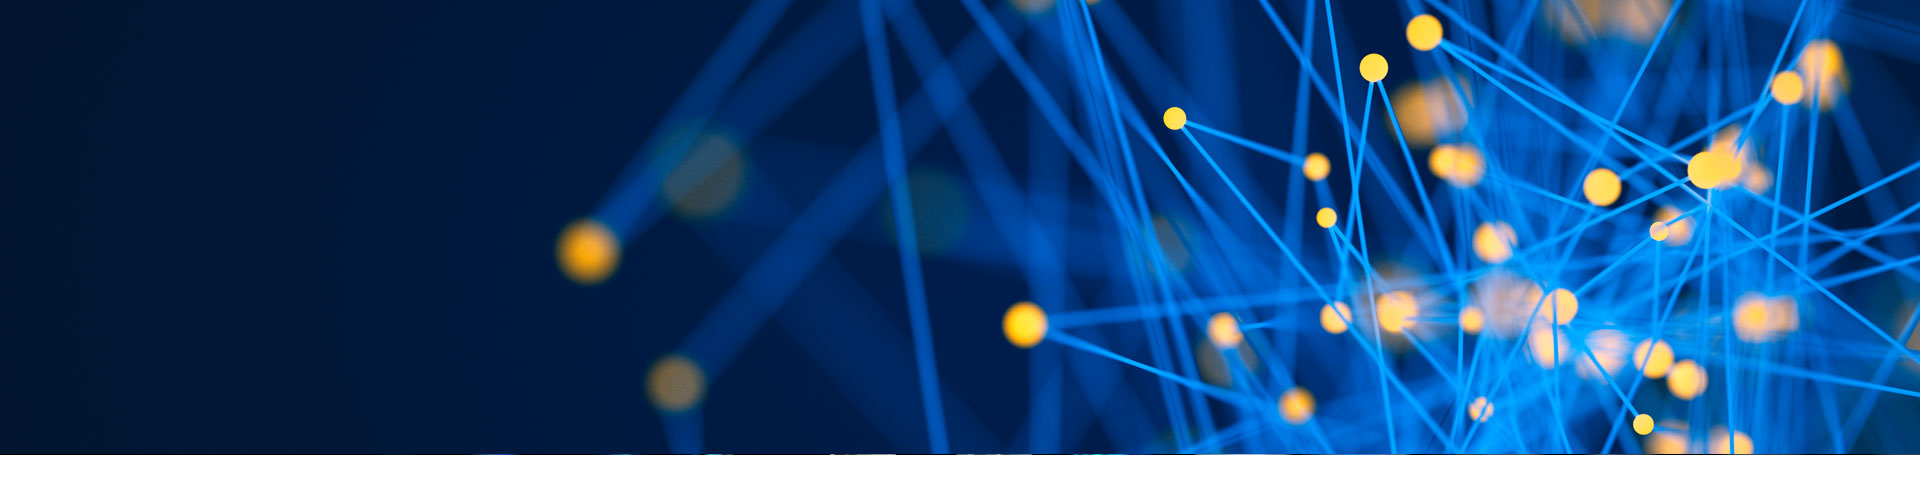 Promwad Partnership Network